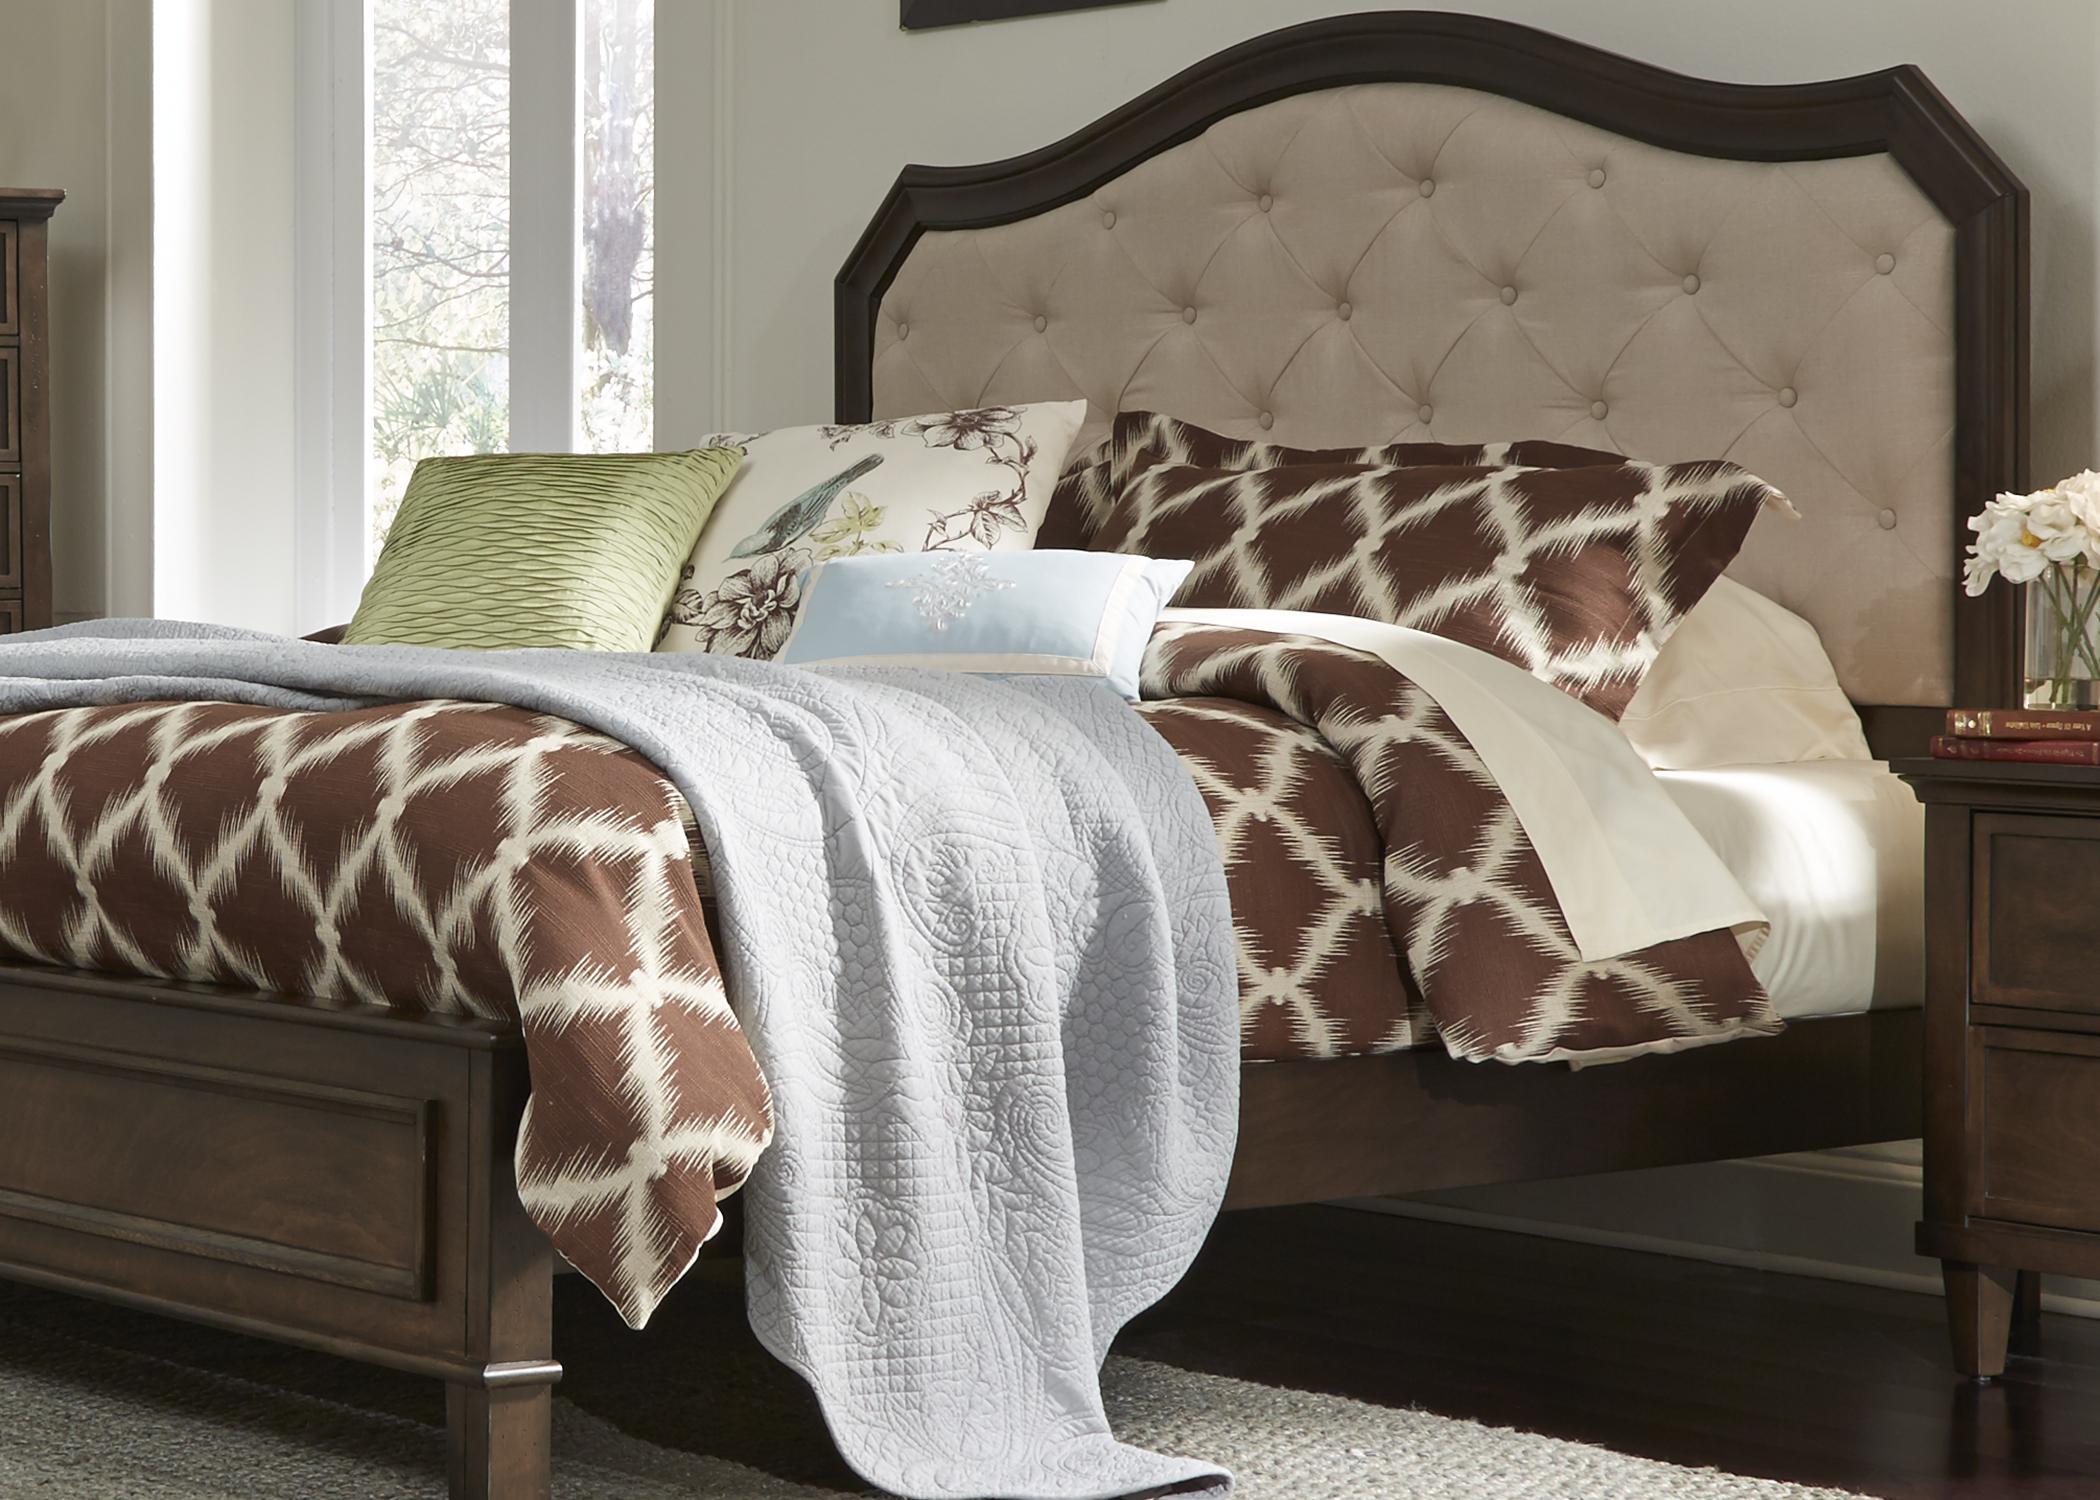 Liberty Furniture King Uph Headboard & Footboard - Linen